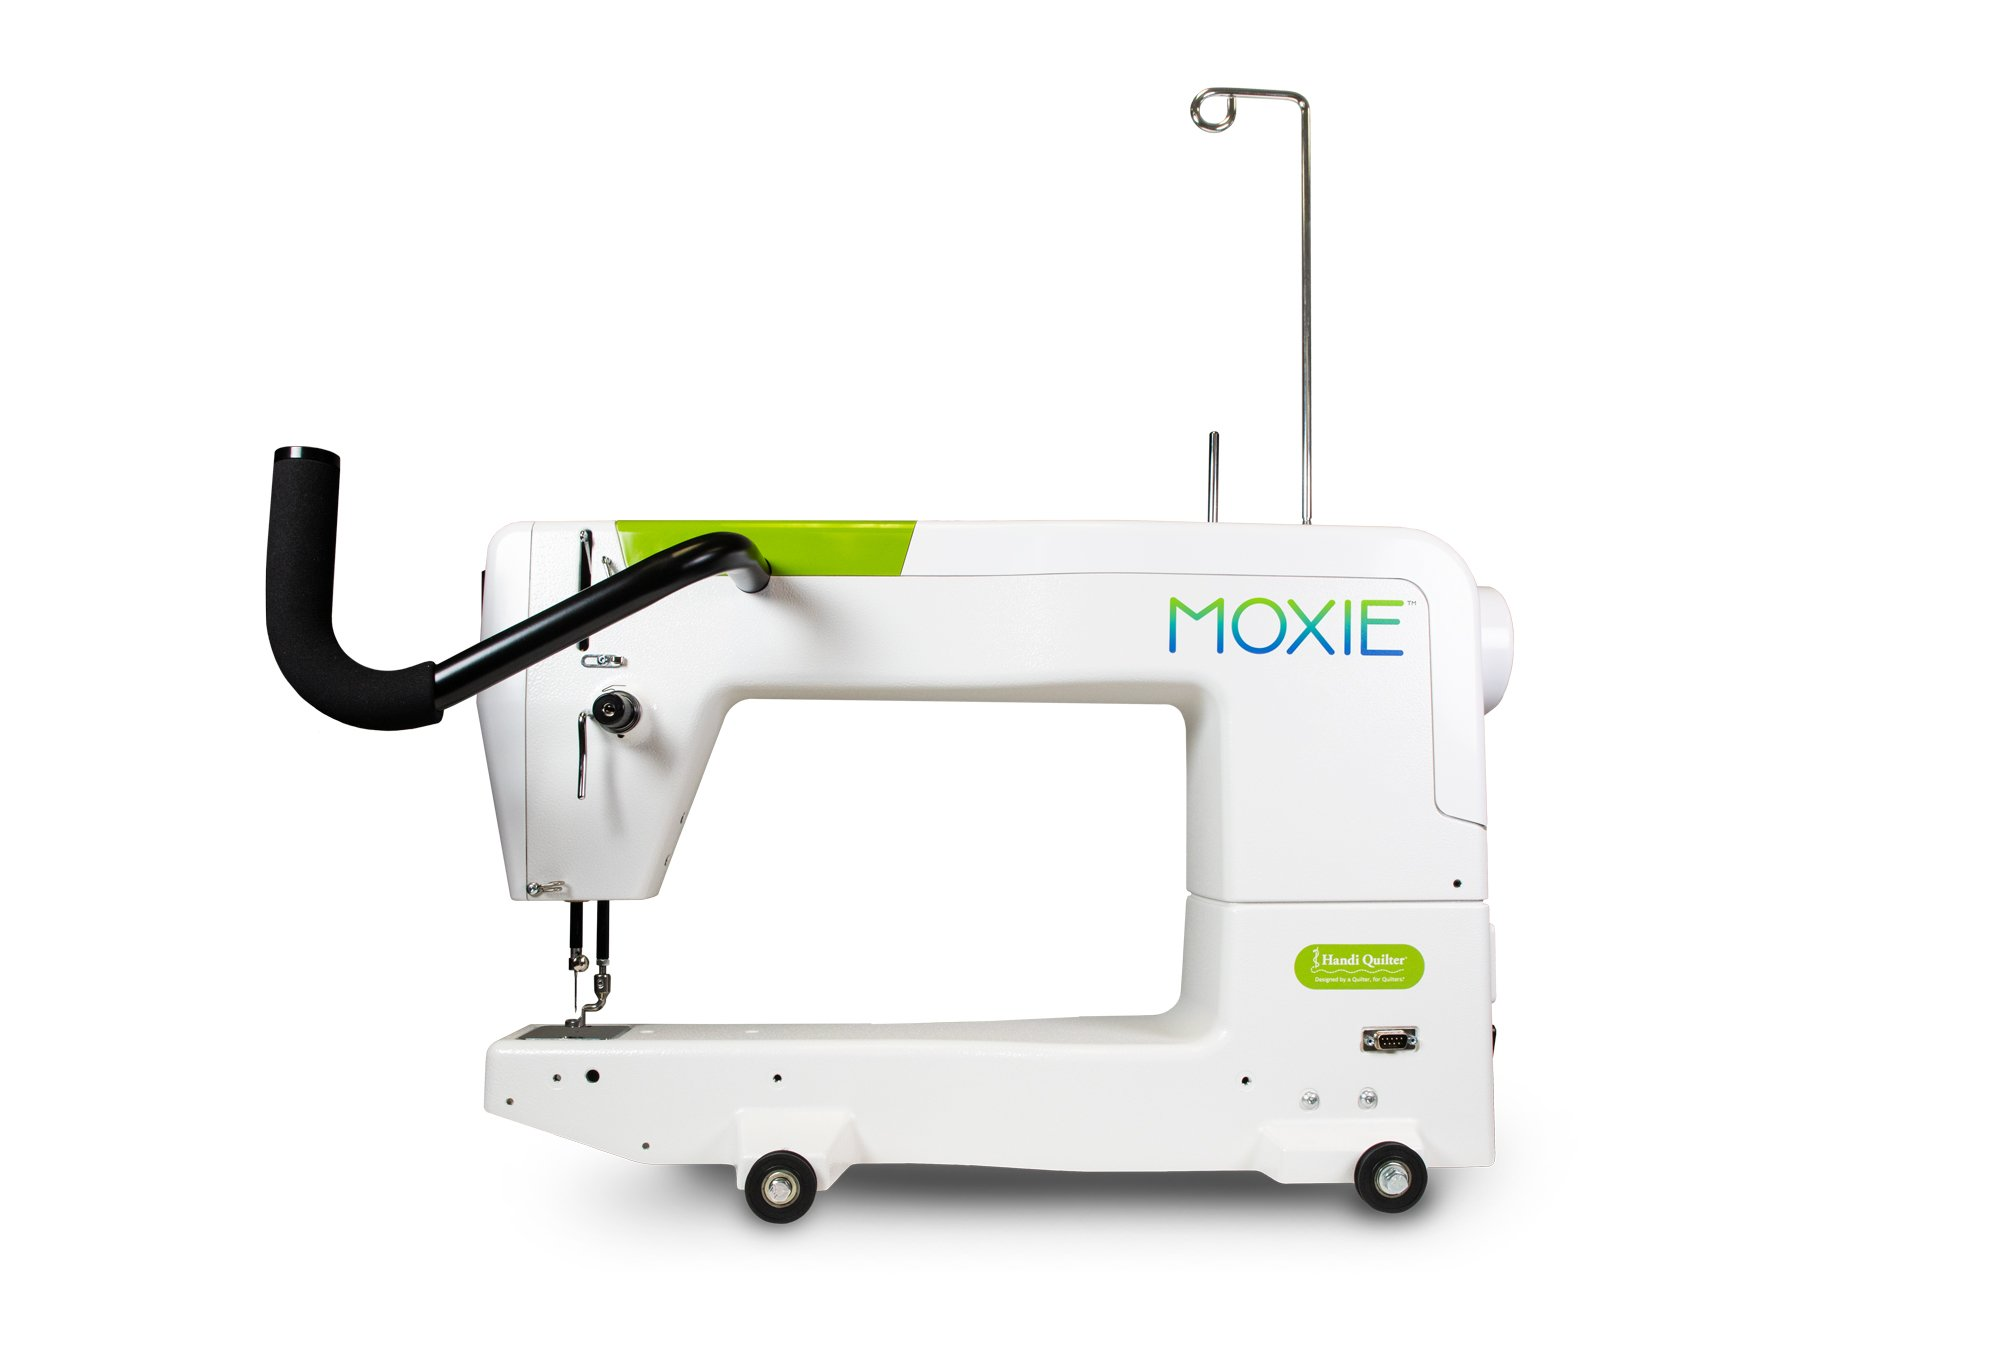 Handi Quilter Moxie Bundle